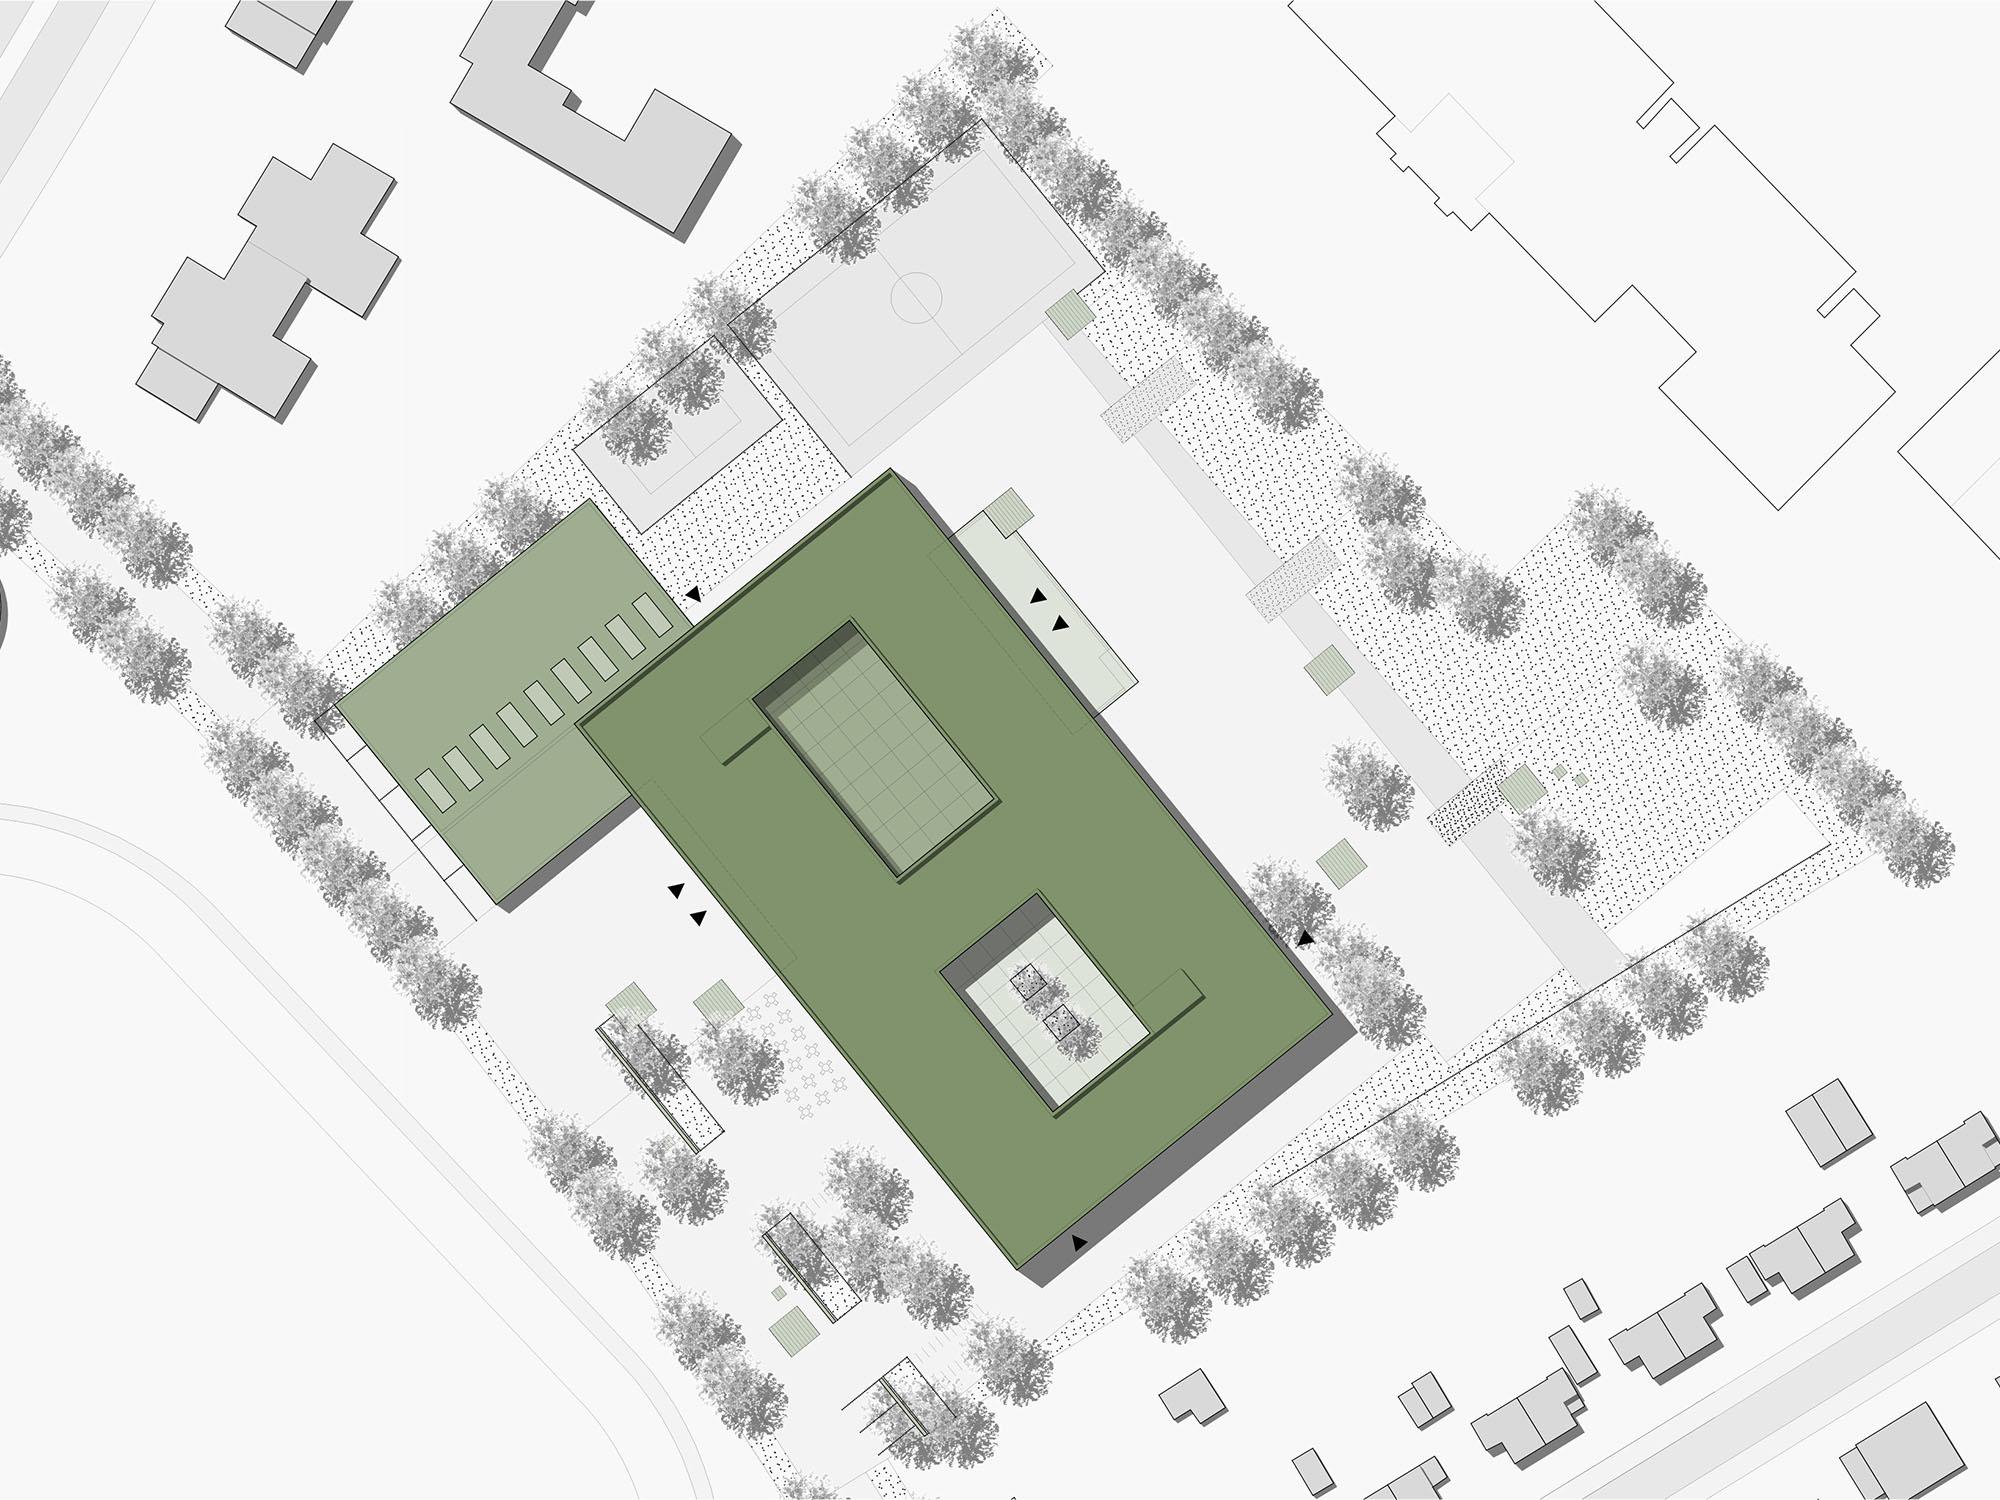 Lise-Meitner Oberstufenzentrum Berlin-Neukölln